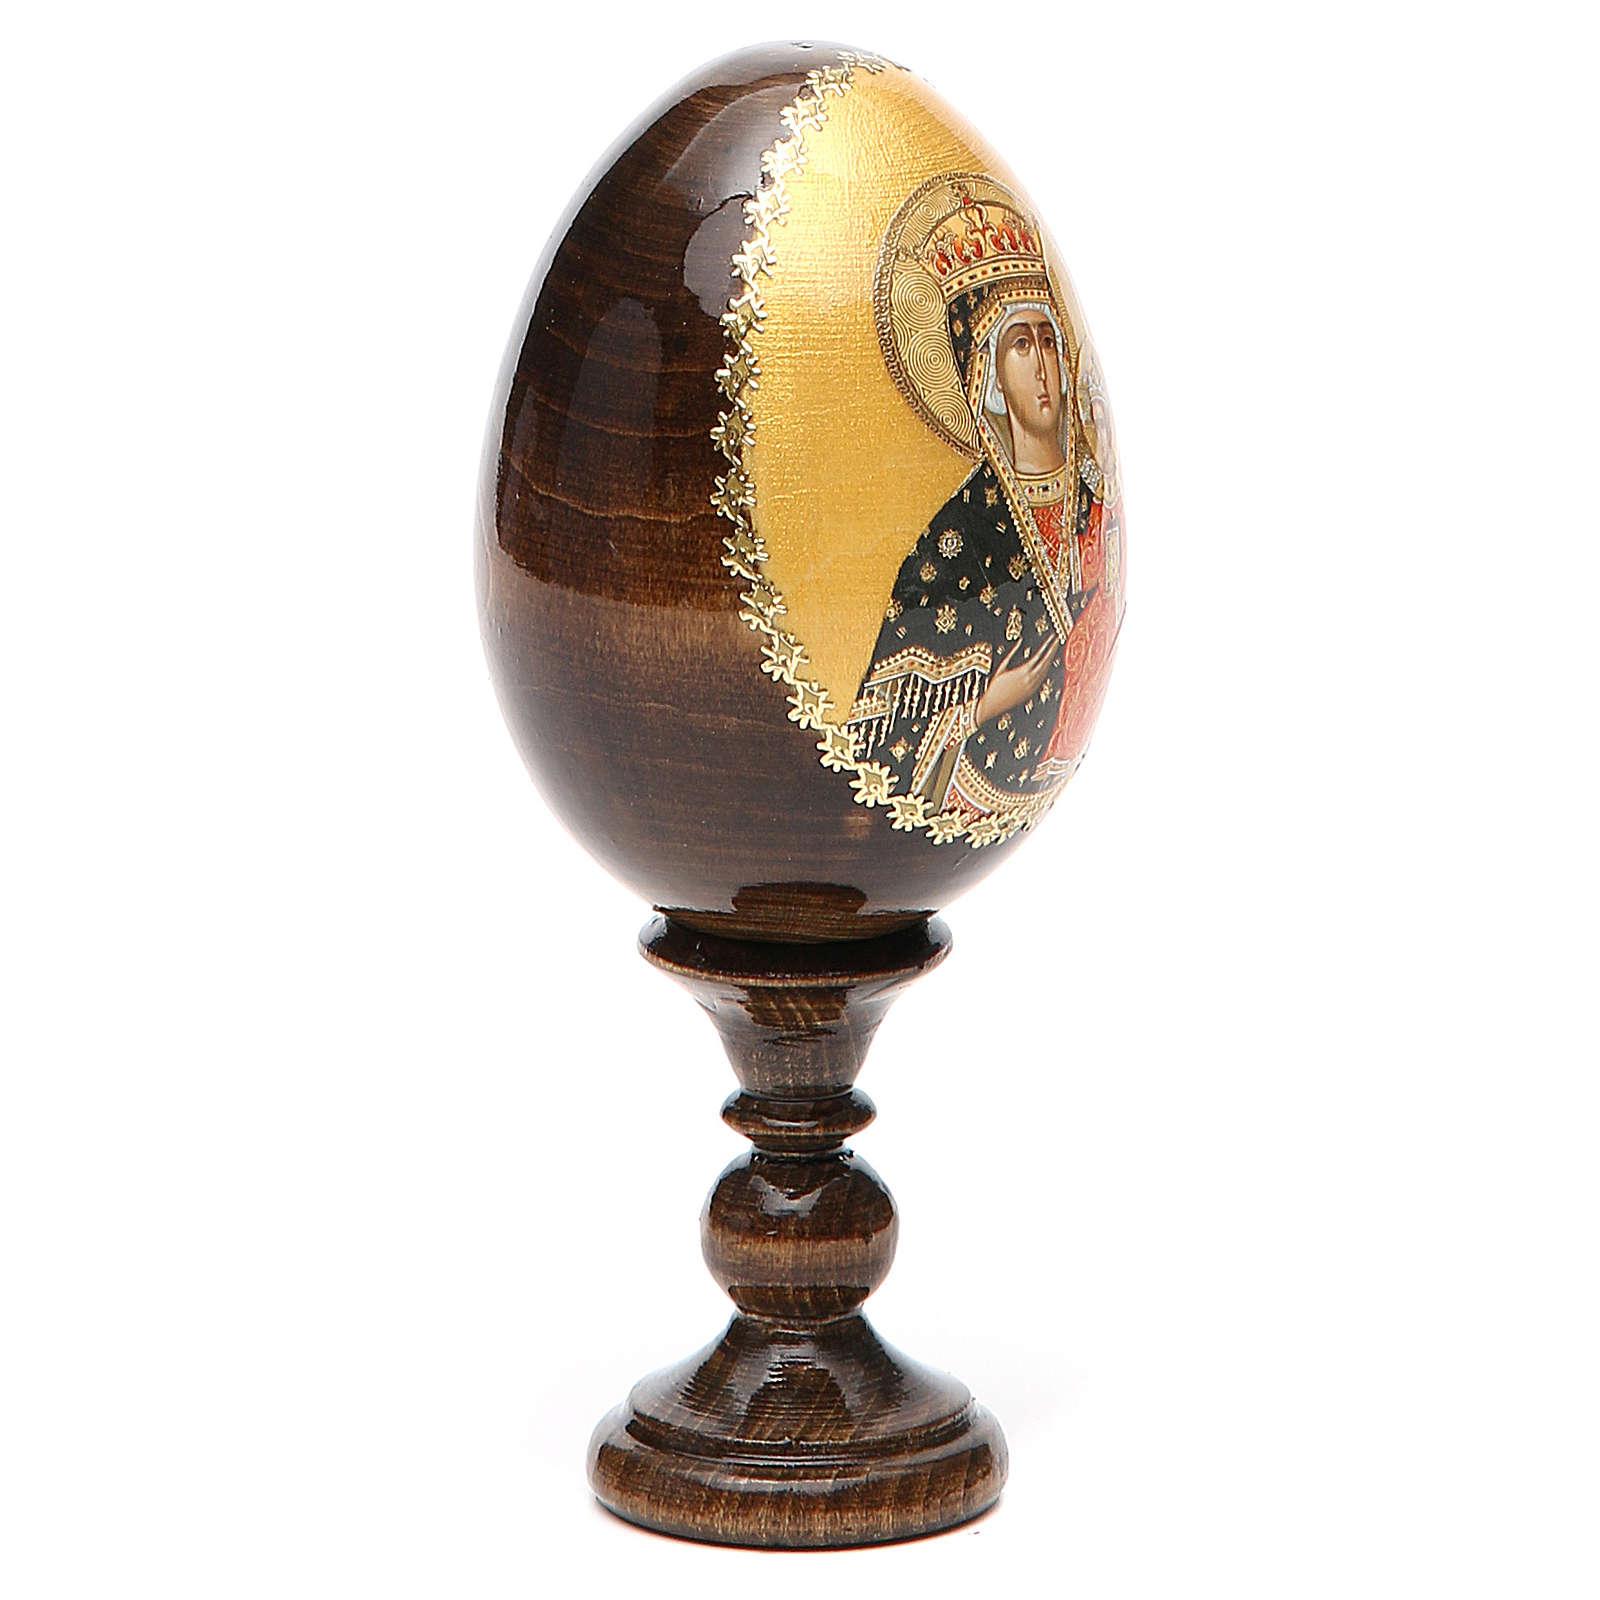 Russian Egg Chenstohovskaya découpage 13cm 4